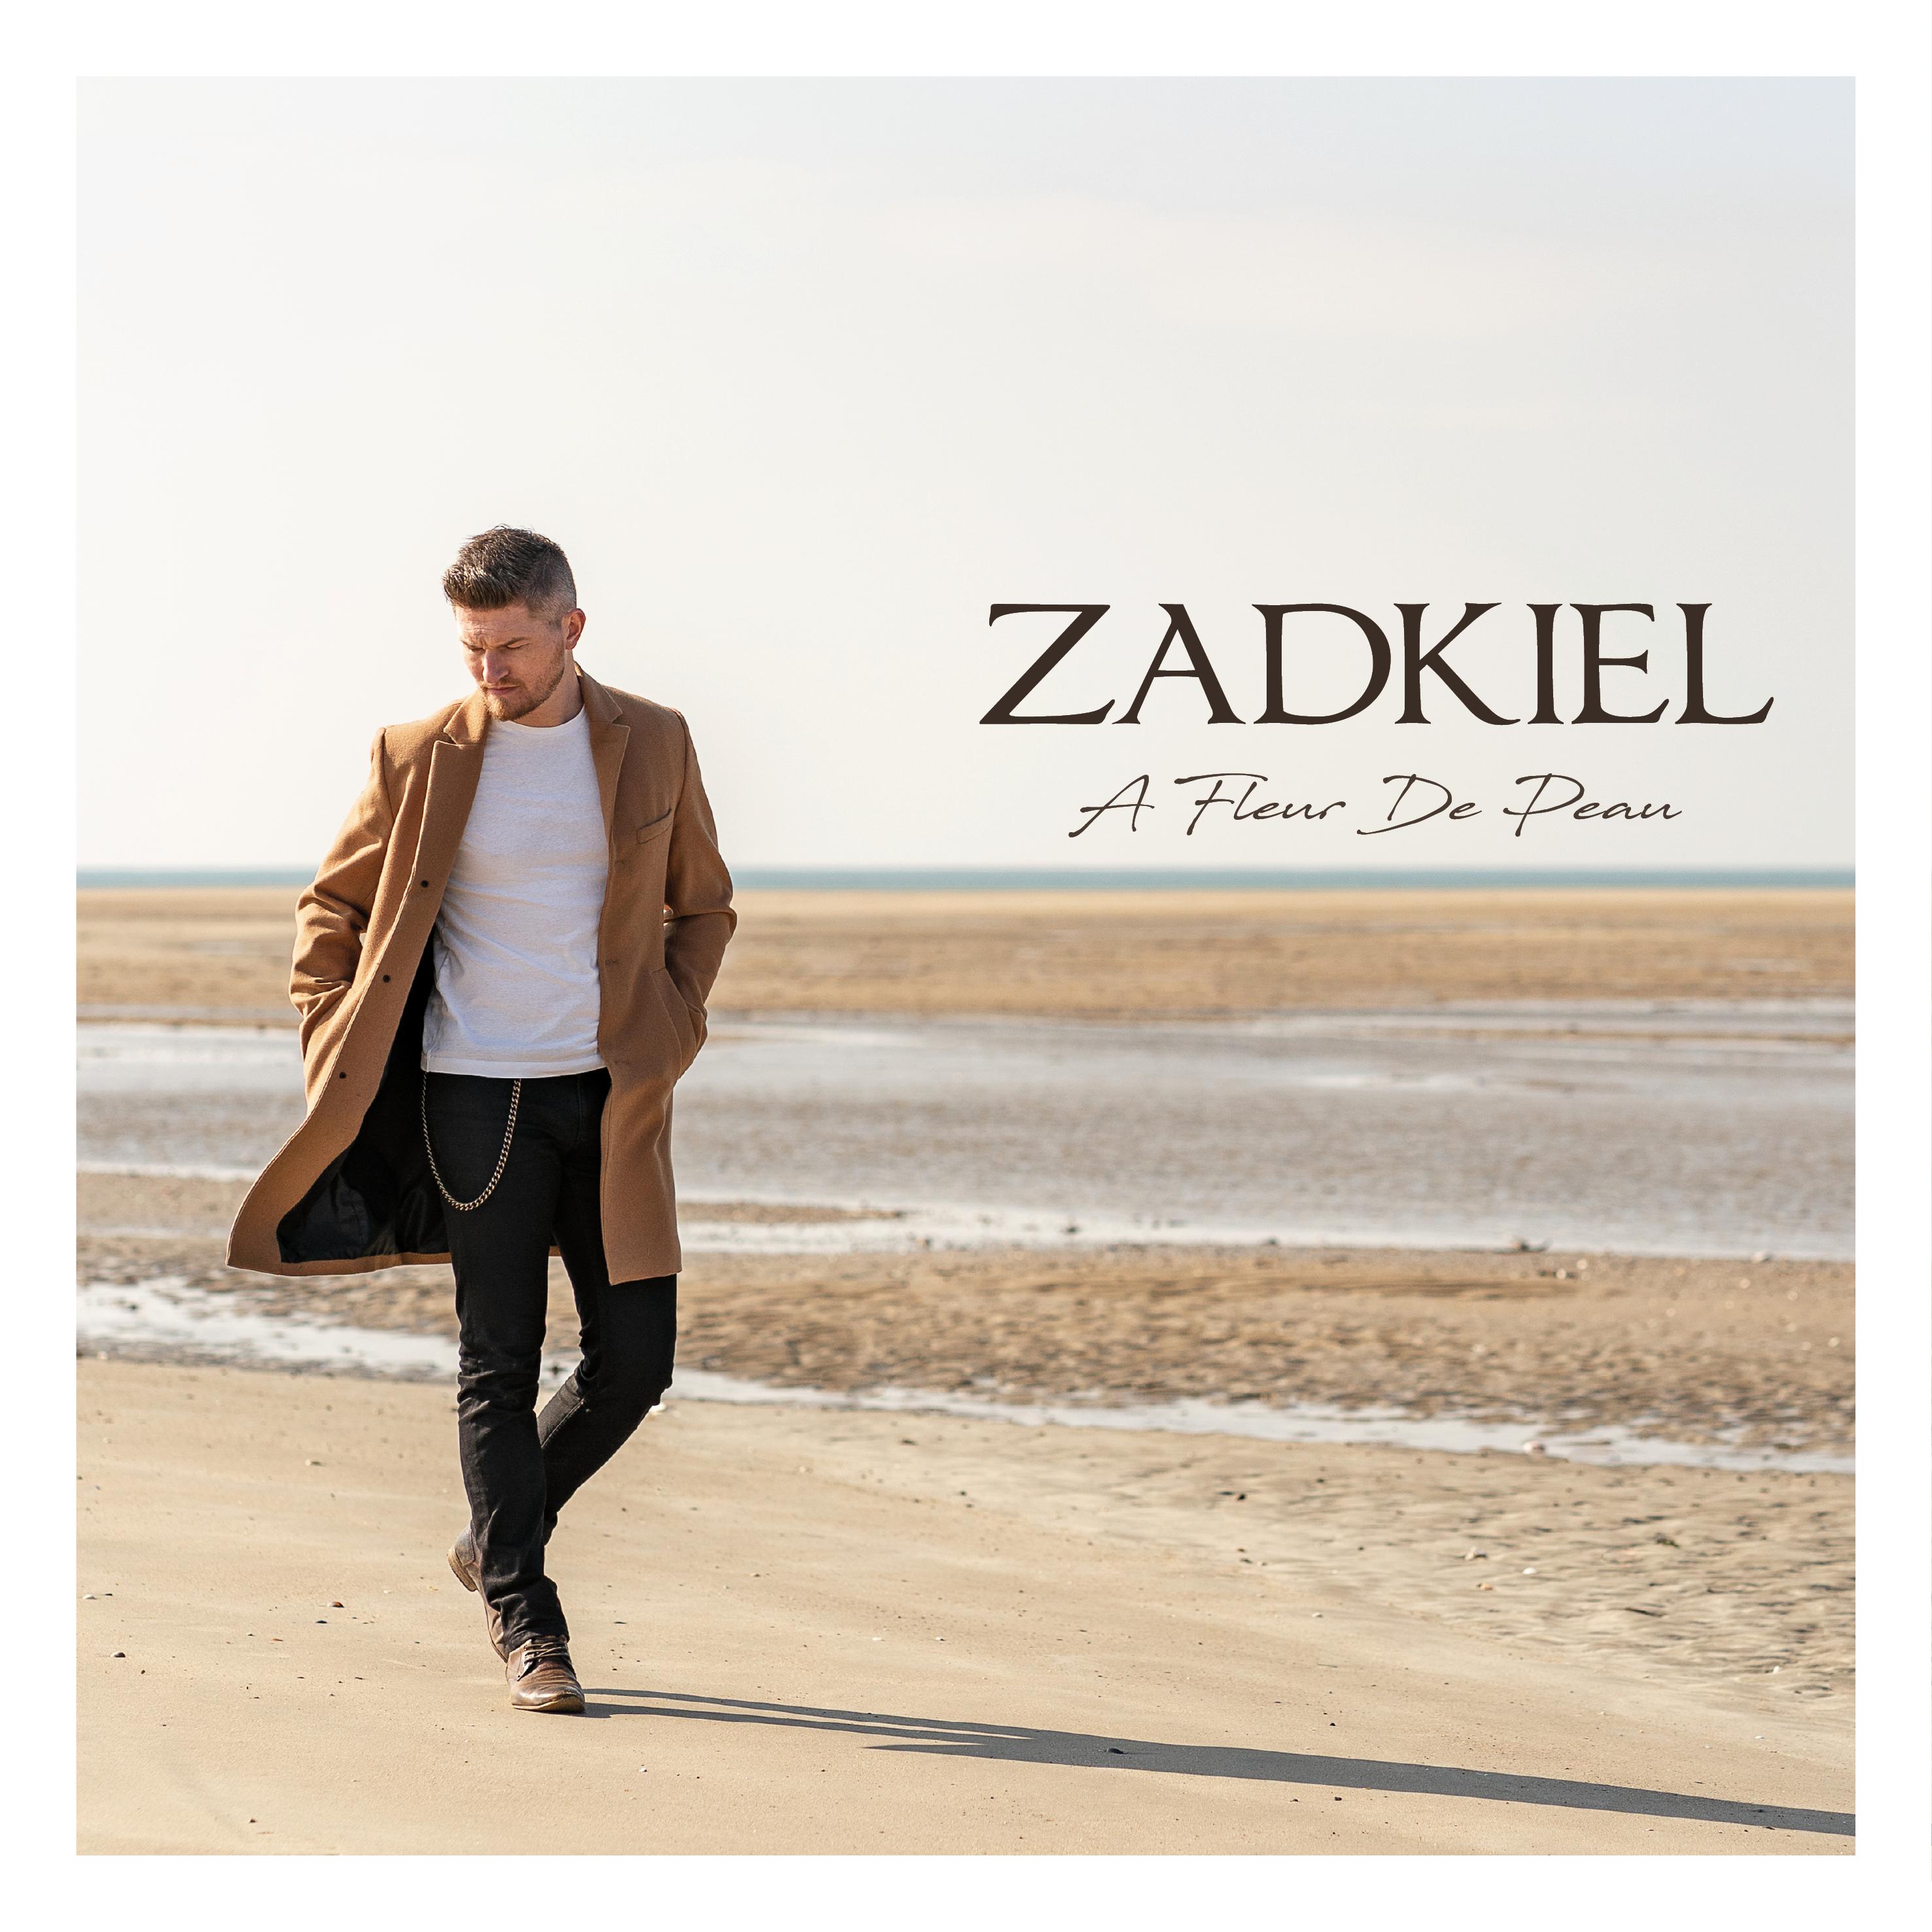 Zadkiel - A Fleur de Peau